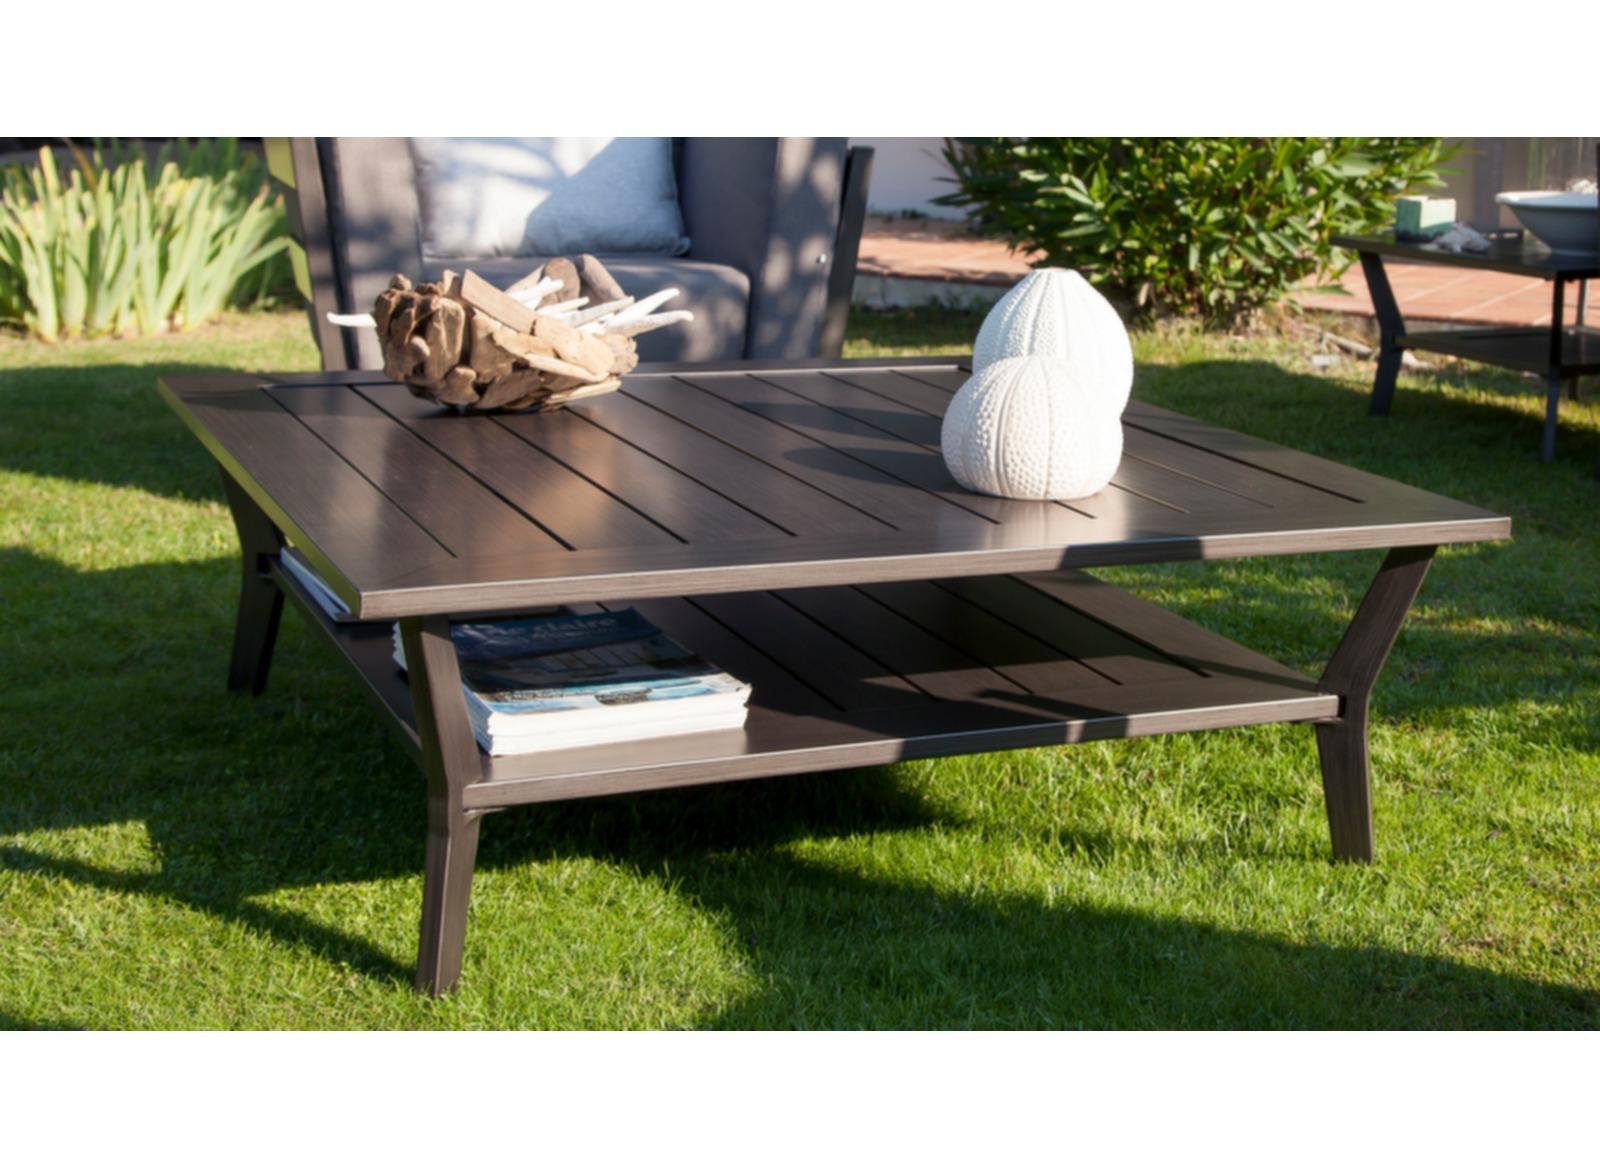 Table basse jardin 2 niveaux alu beige 105cm sofa oc o for Jardin 2 niveaux